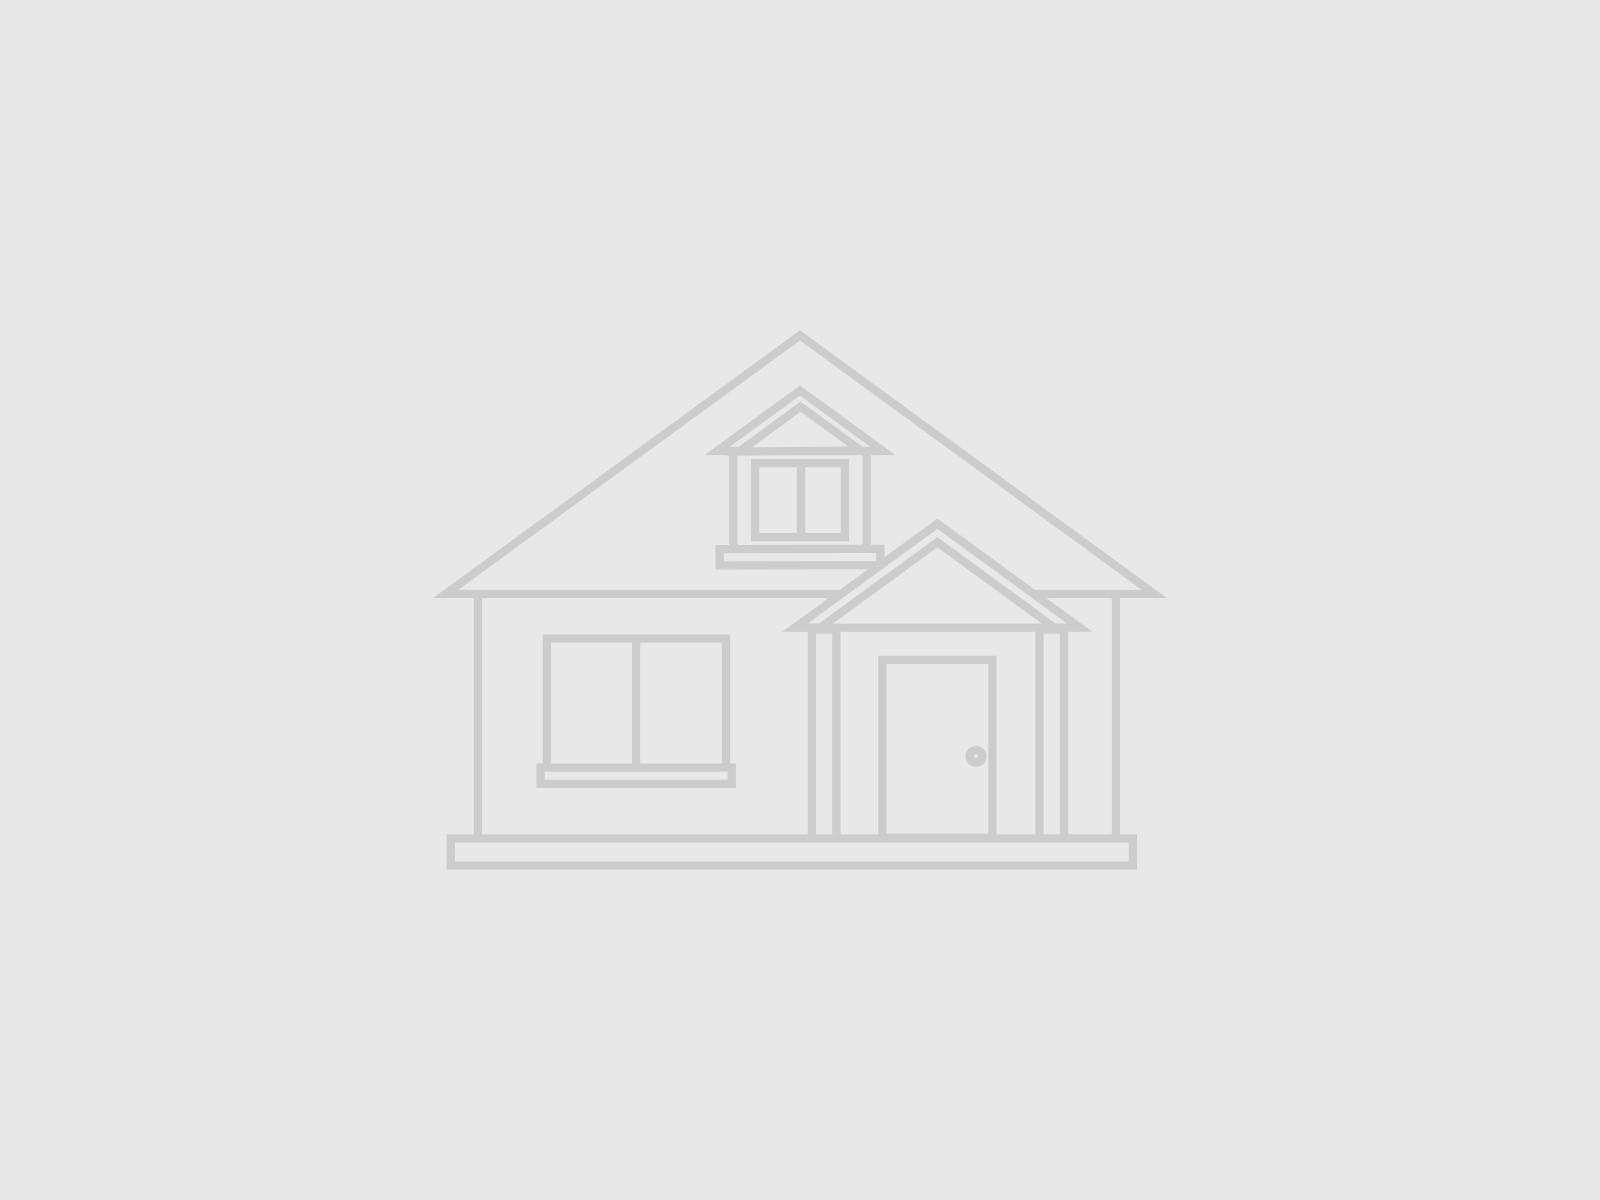 539 kesterson ct a luxury single family home for sale in rockaway beach, oregon property id 19386610 christie s international real estate